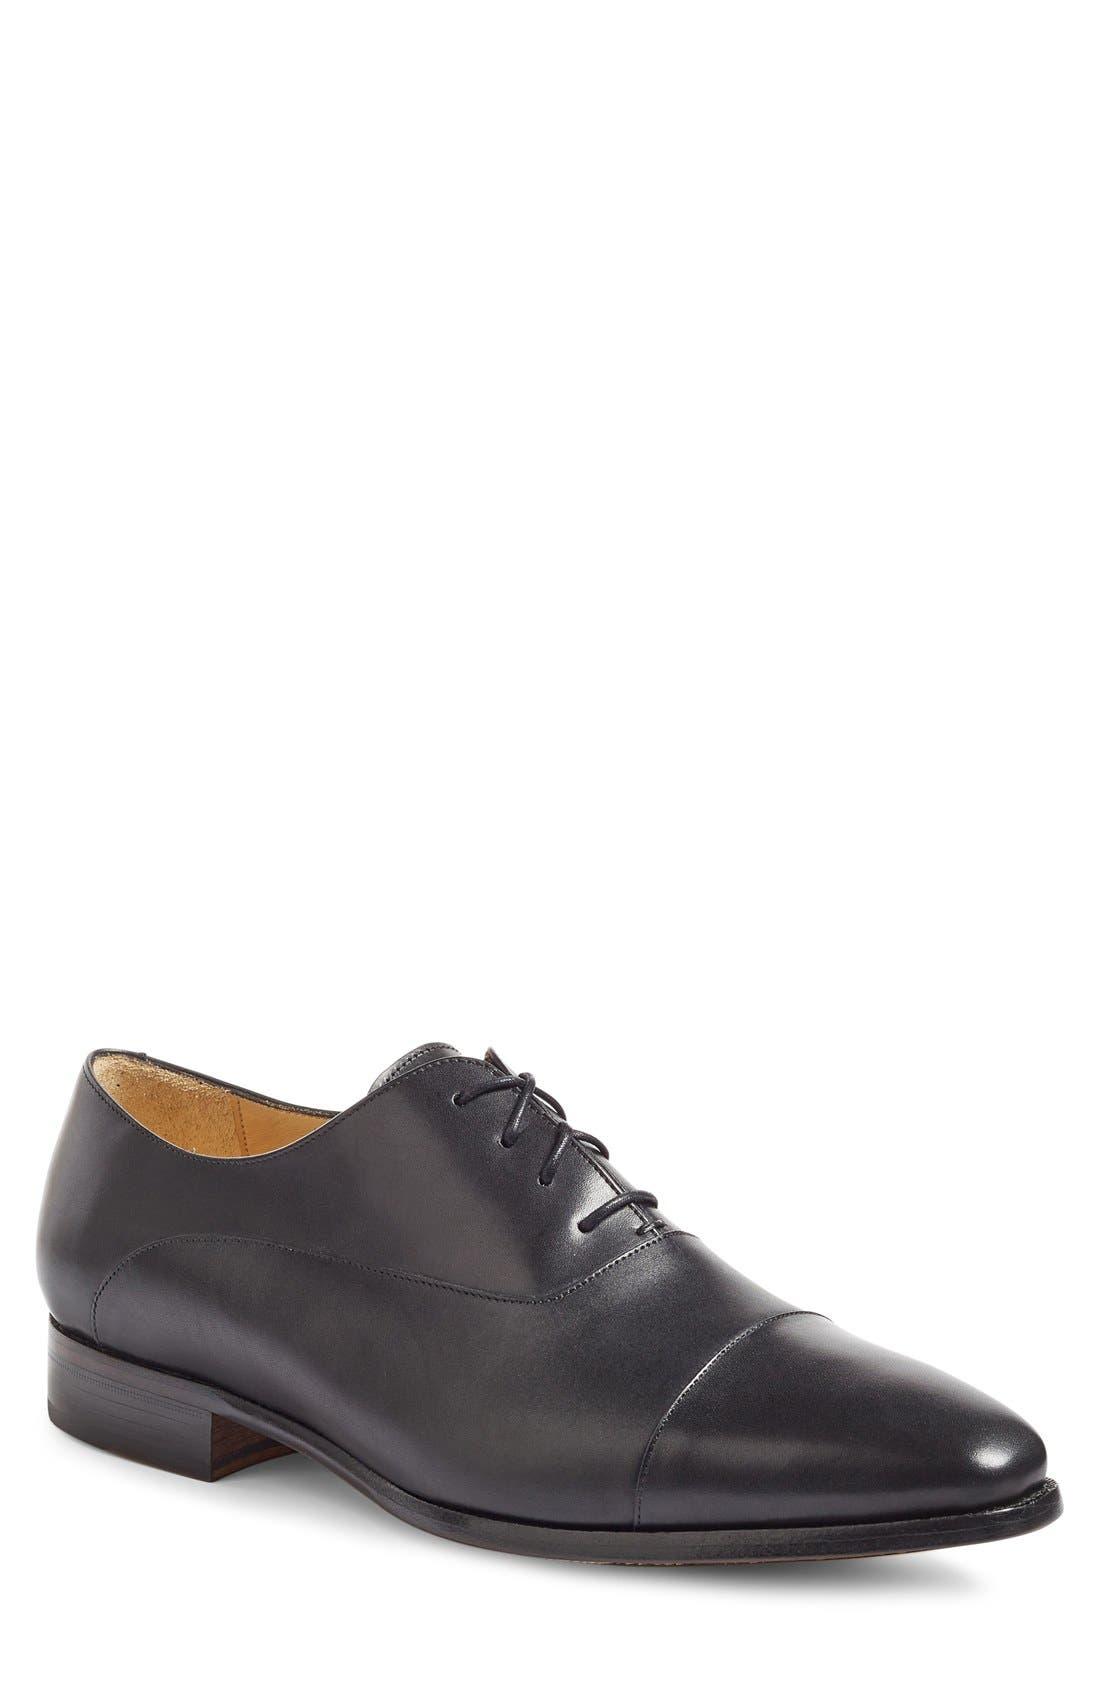 Joe Cap Toe Oxford,                         Main,                         color, Black Leather